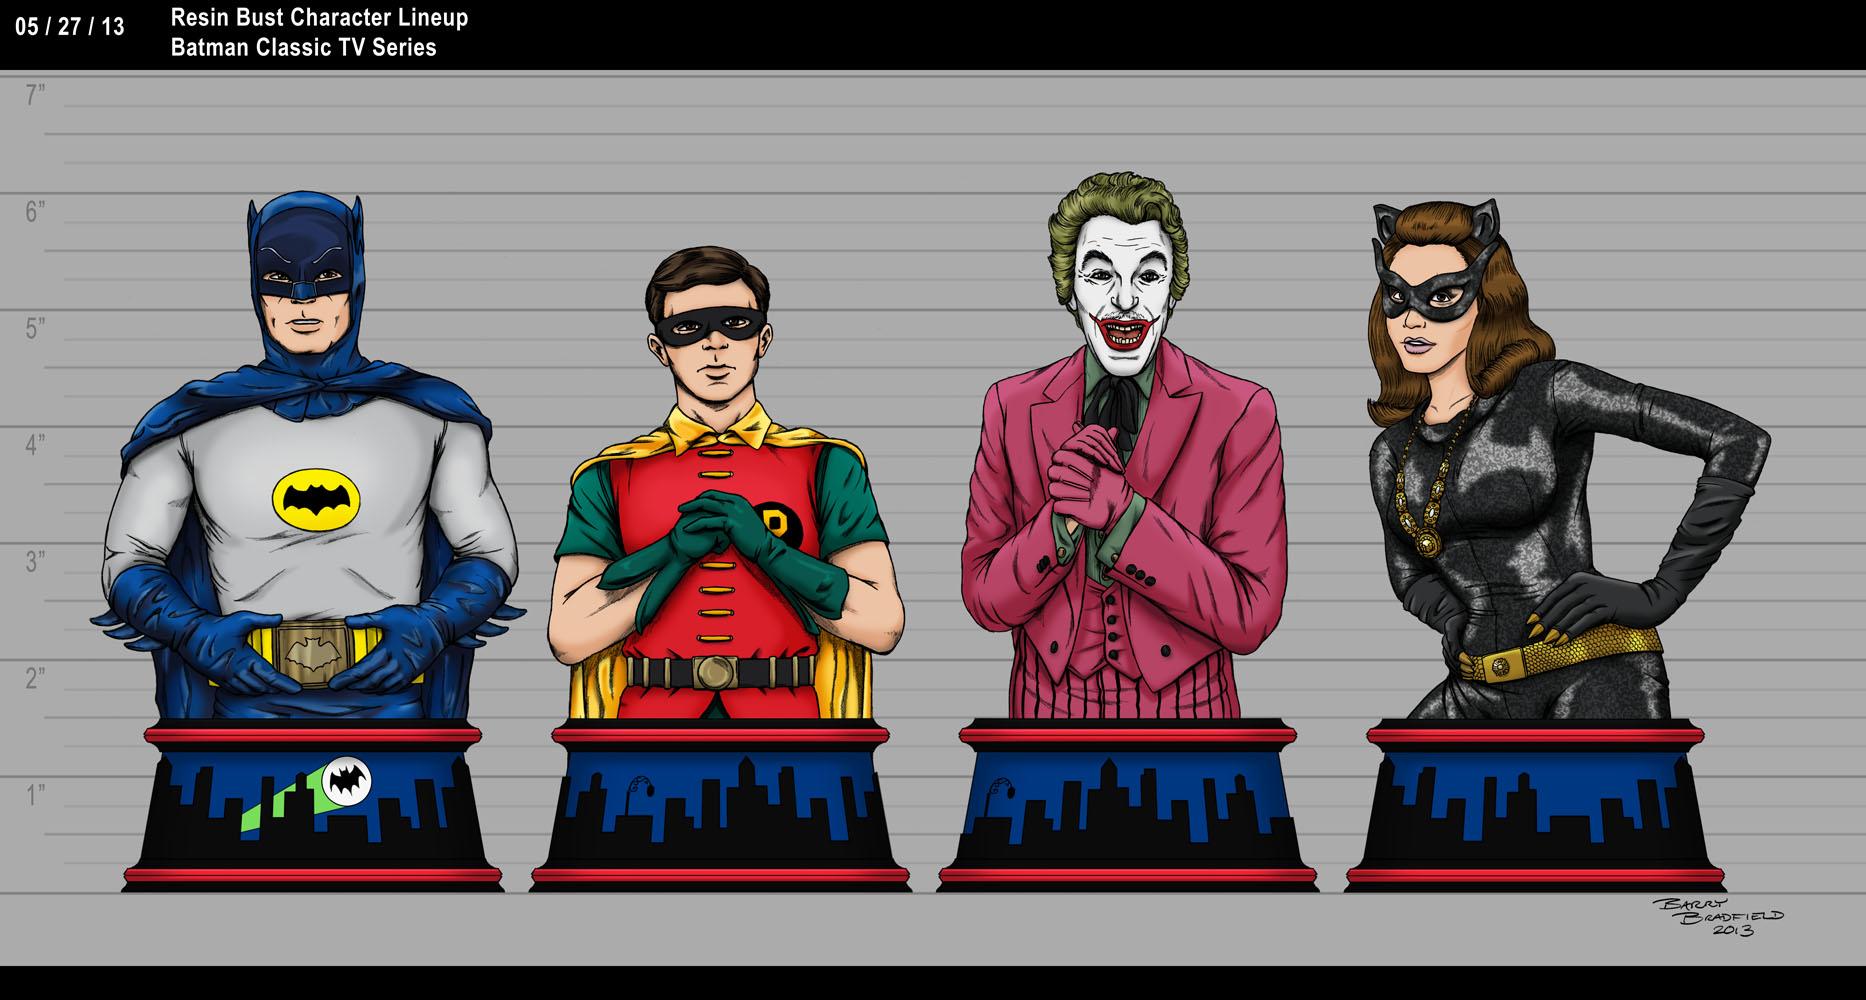 Batman Classic TV Series - Batman Resin Bust Character Lineup